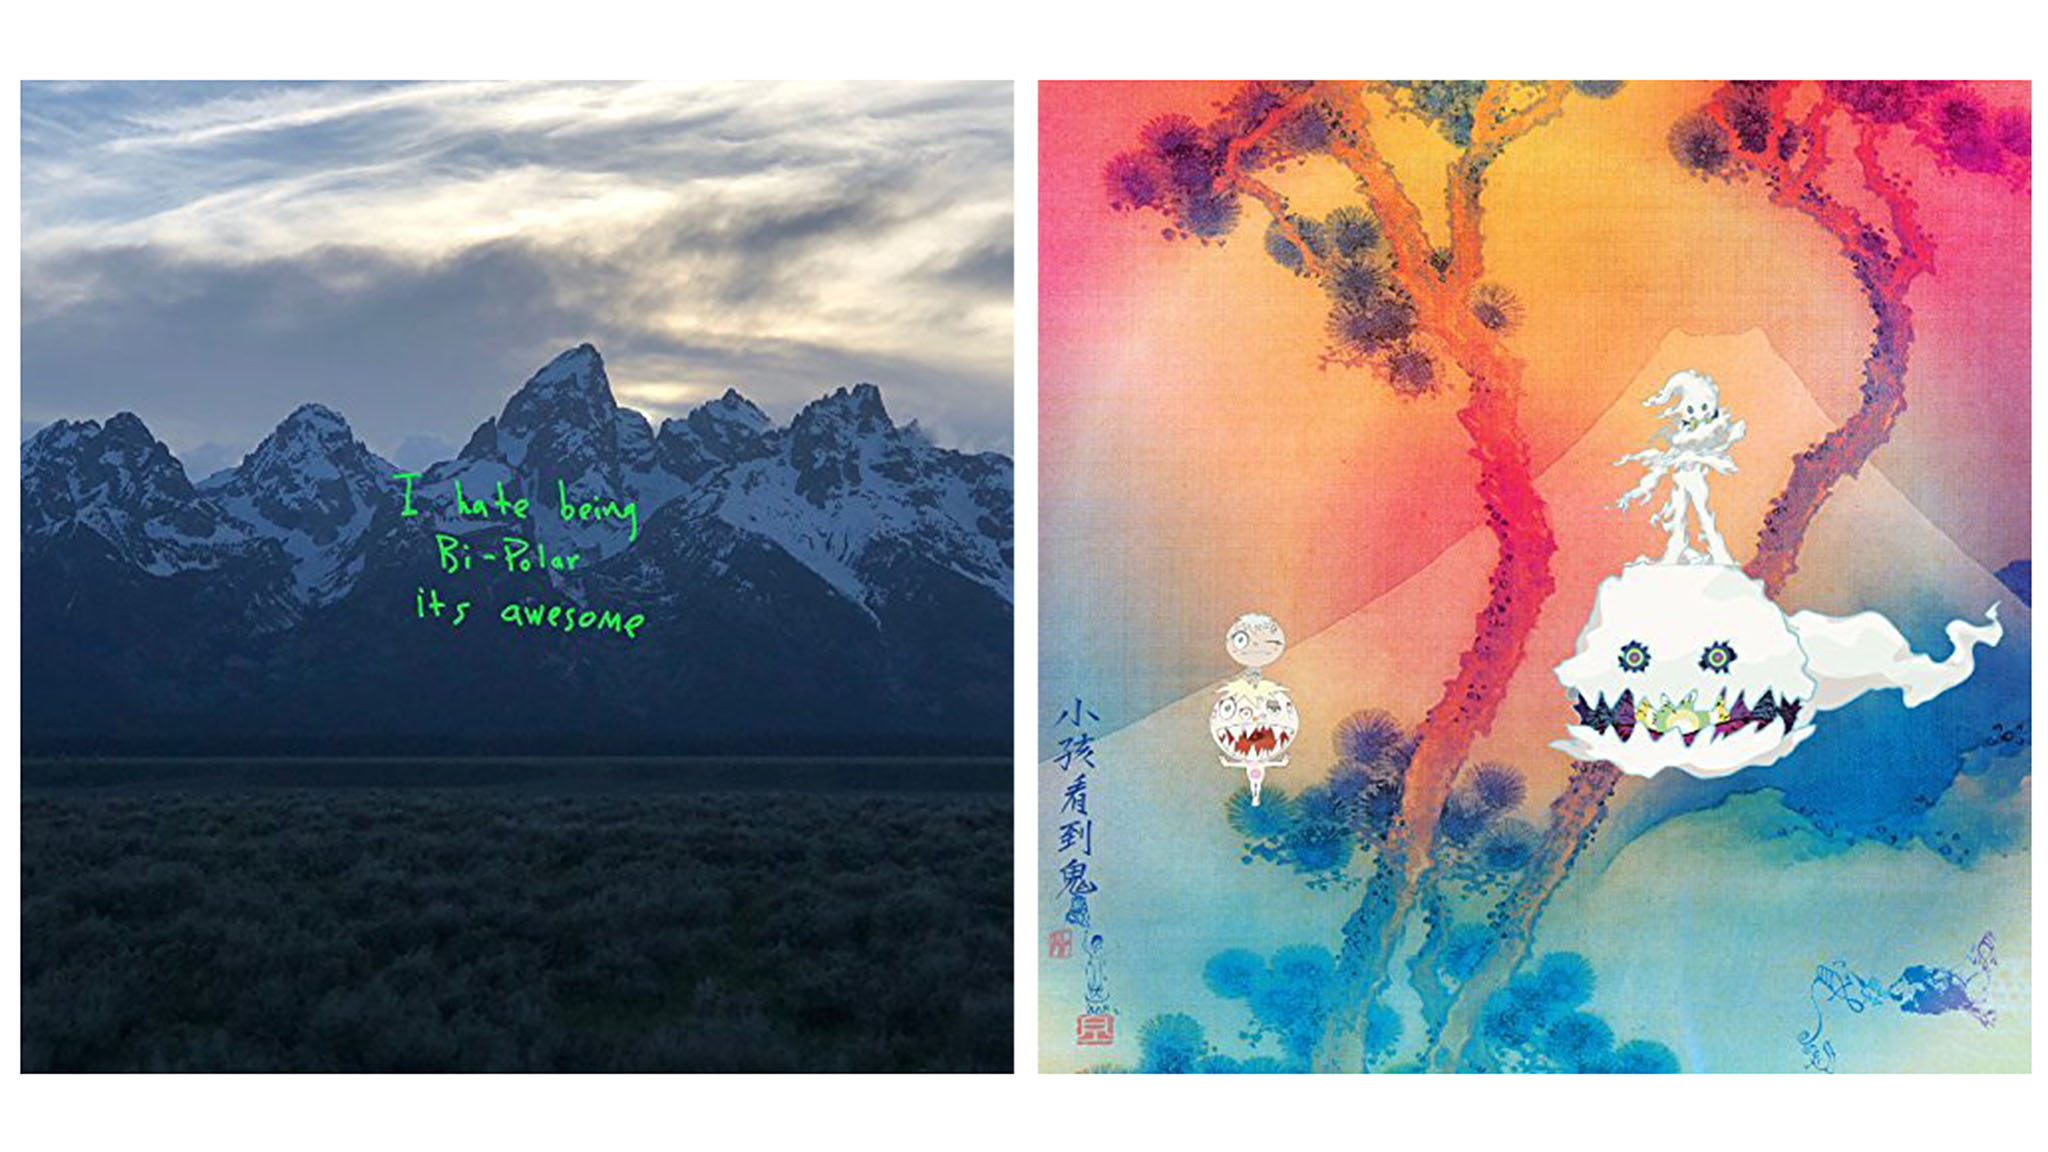 Kanye West Yekids See Ghosts Scrappy Songs Financial